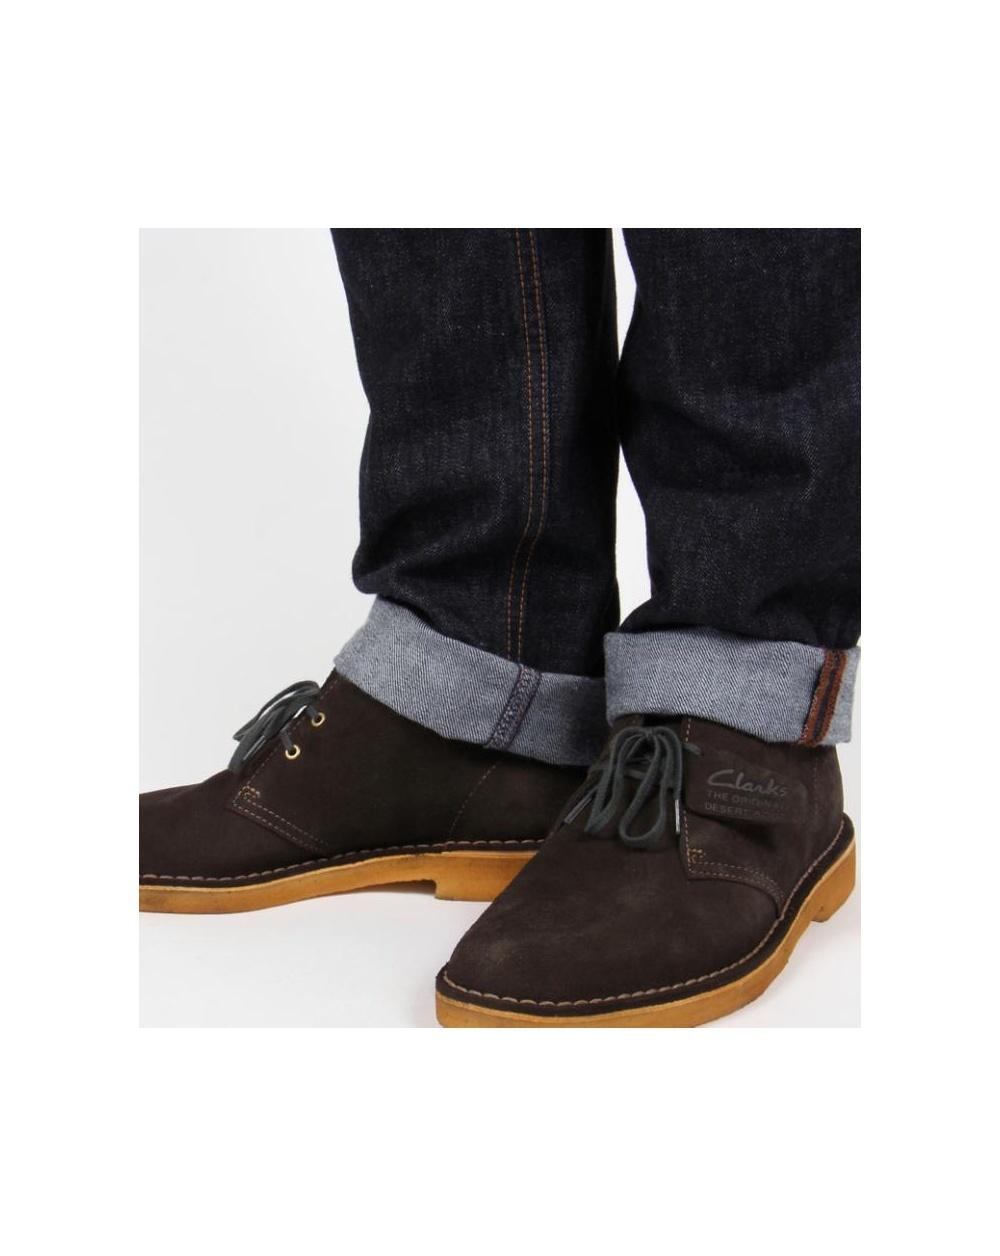 clarks originals desert boots in suede loden green shoes mens. Black Bedroom Furniture Sets. Home Design Ideas